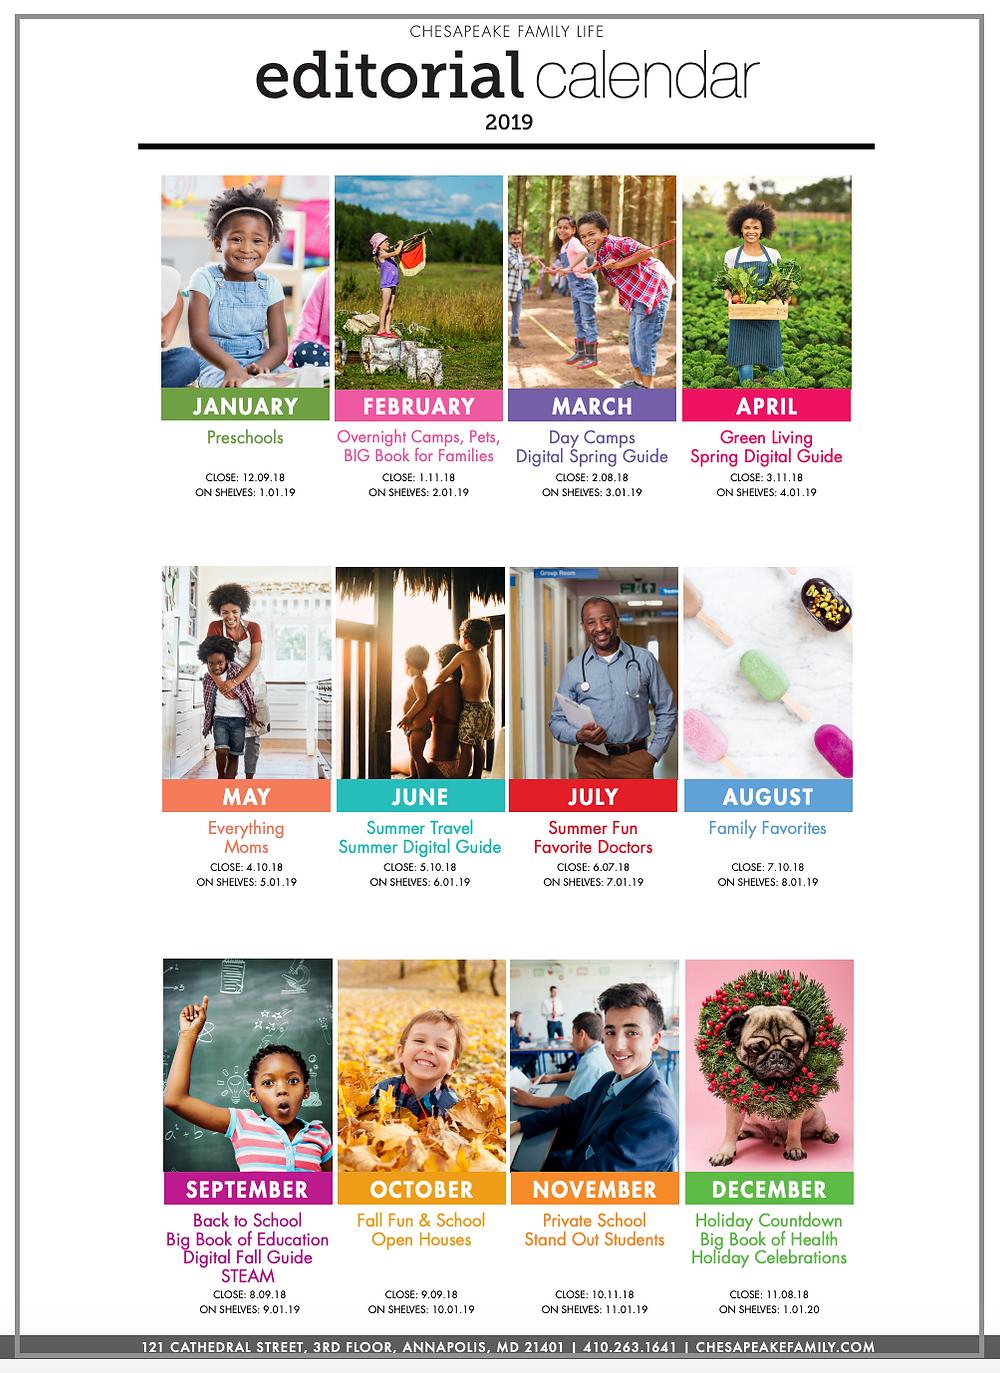 2019 Chesapeake Family Life Editorial Calendar